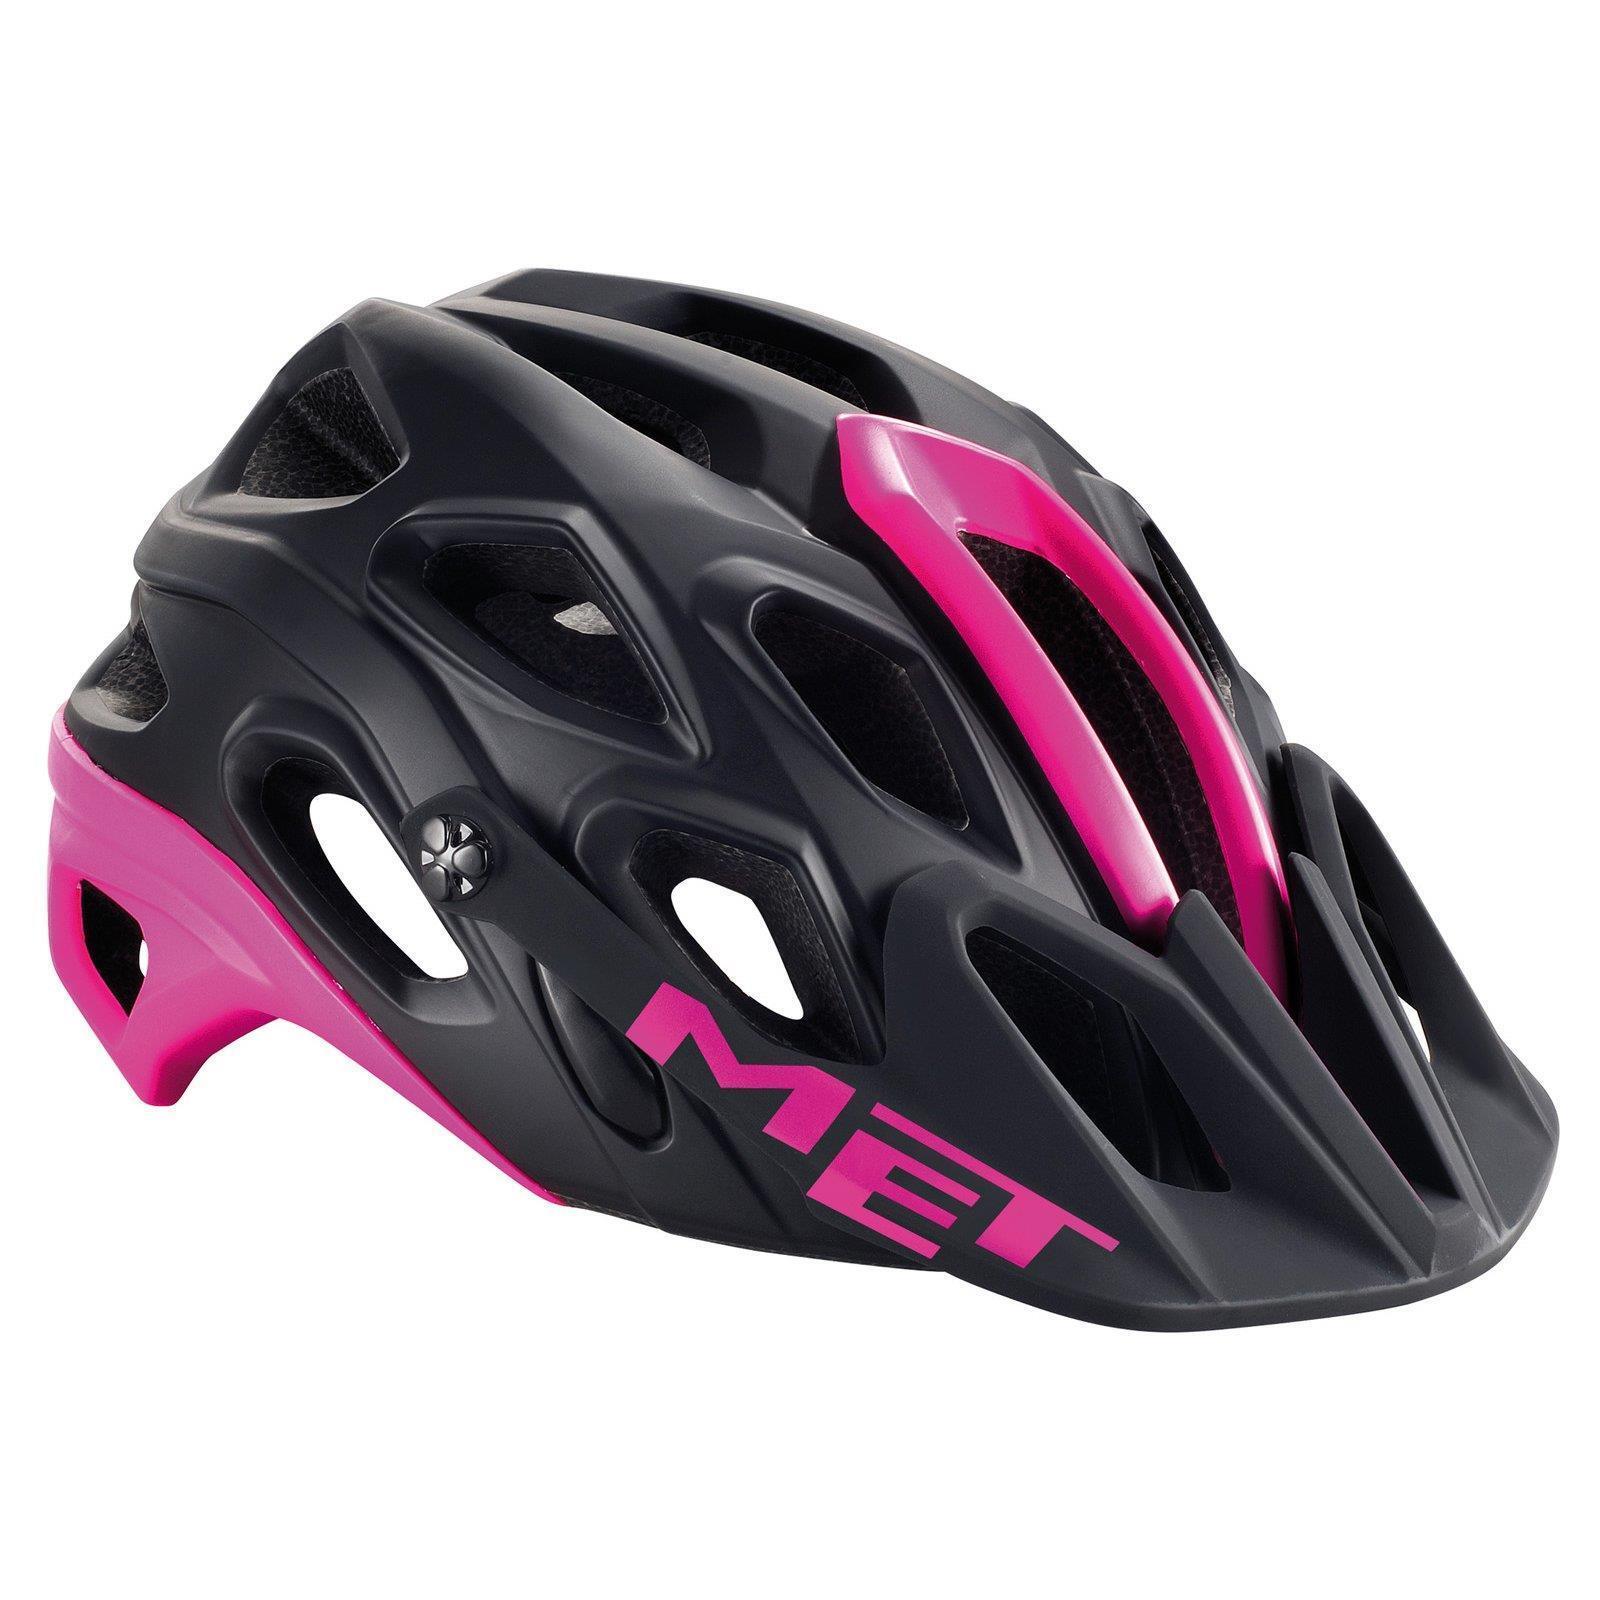 Hydromel Lupo Femmes Bike Casque MTB Vélo Casque Bike Rose Noir Rose VTT girl women c99a13